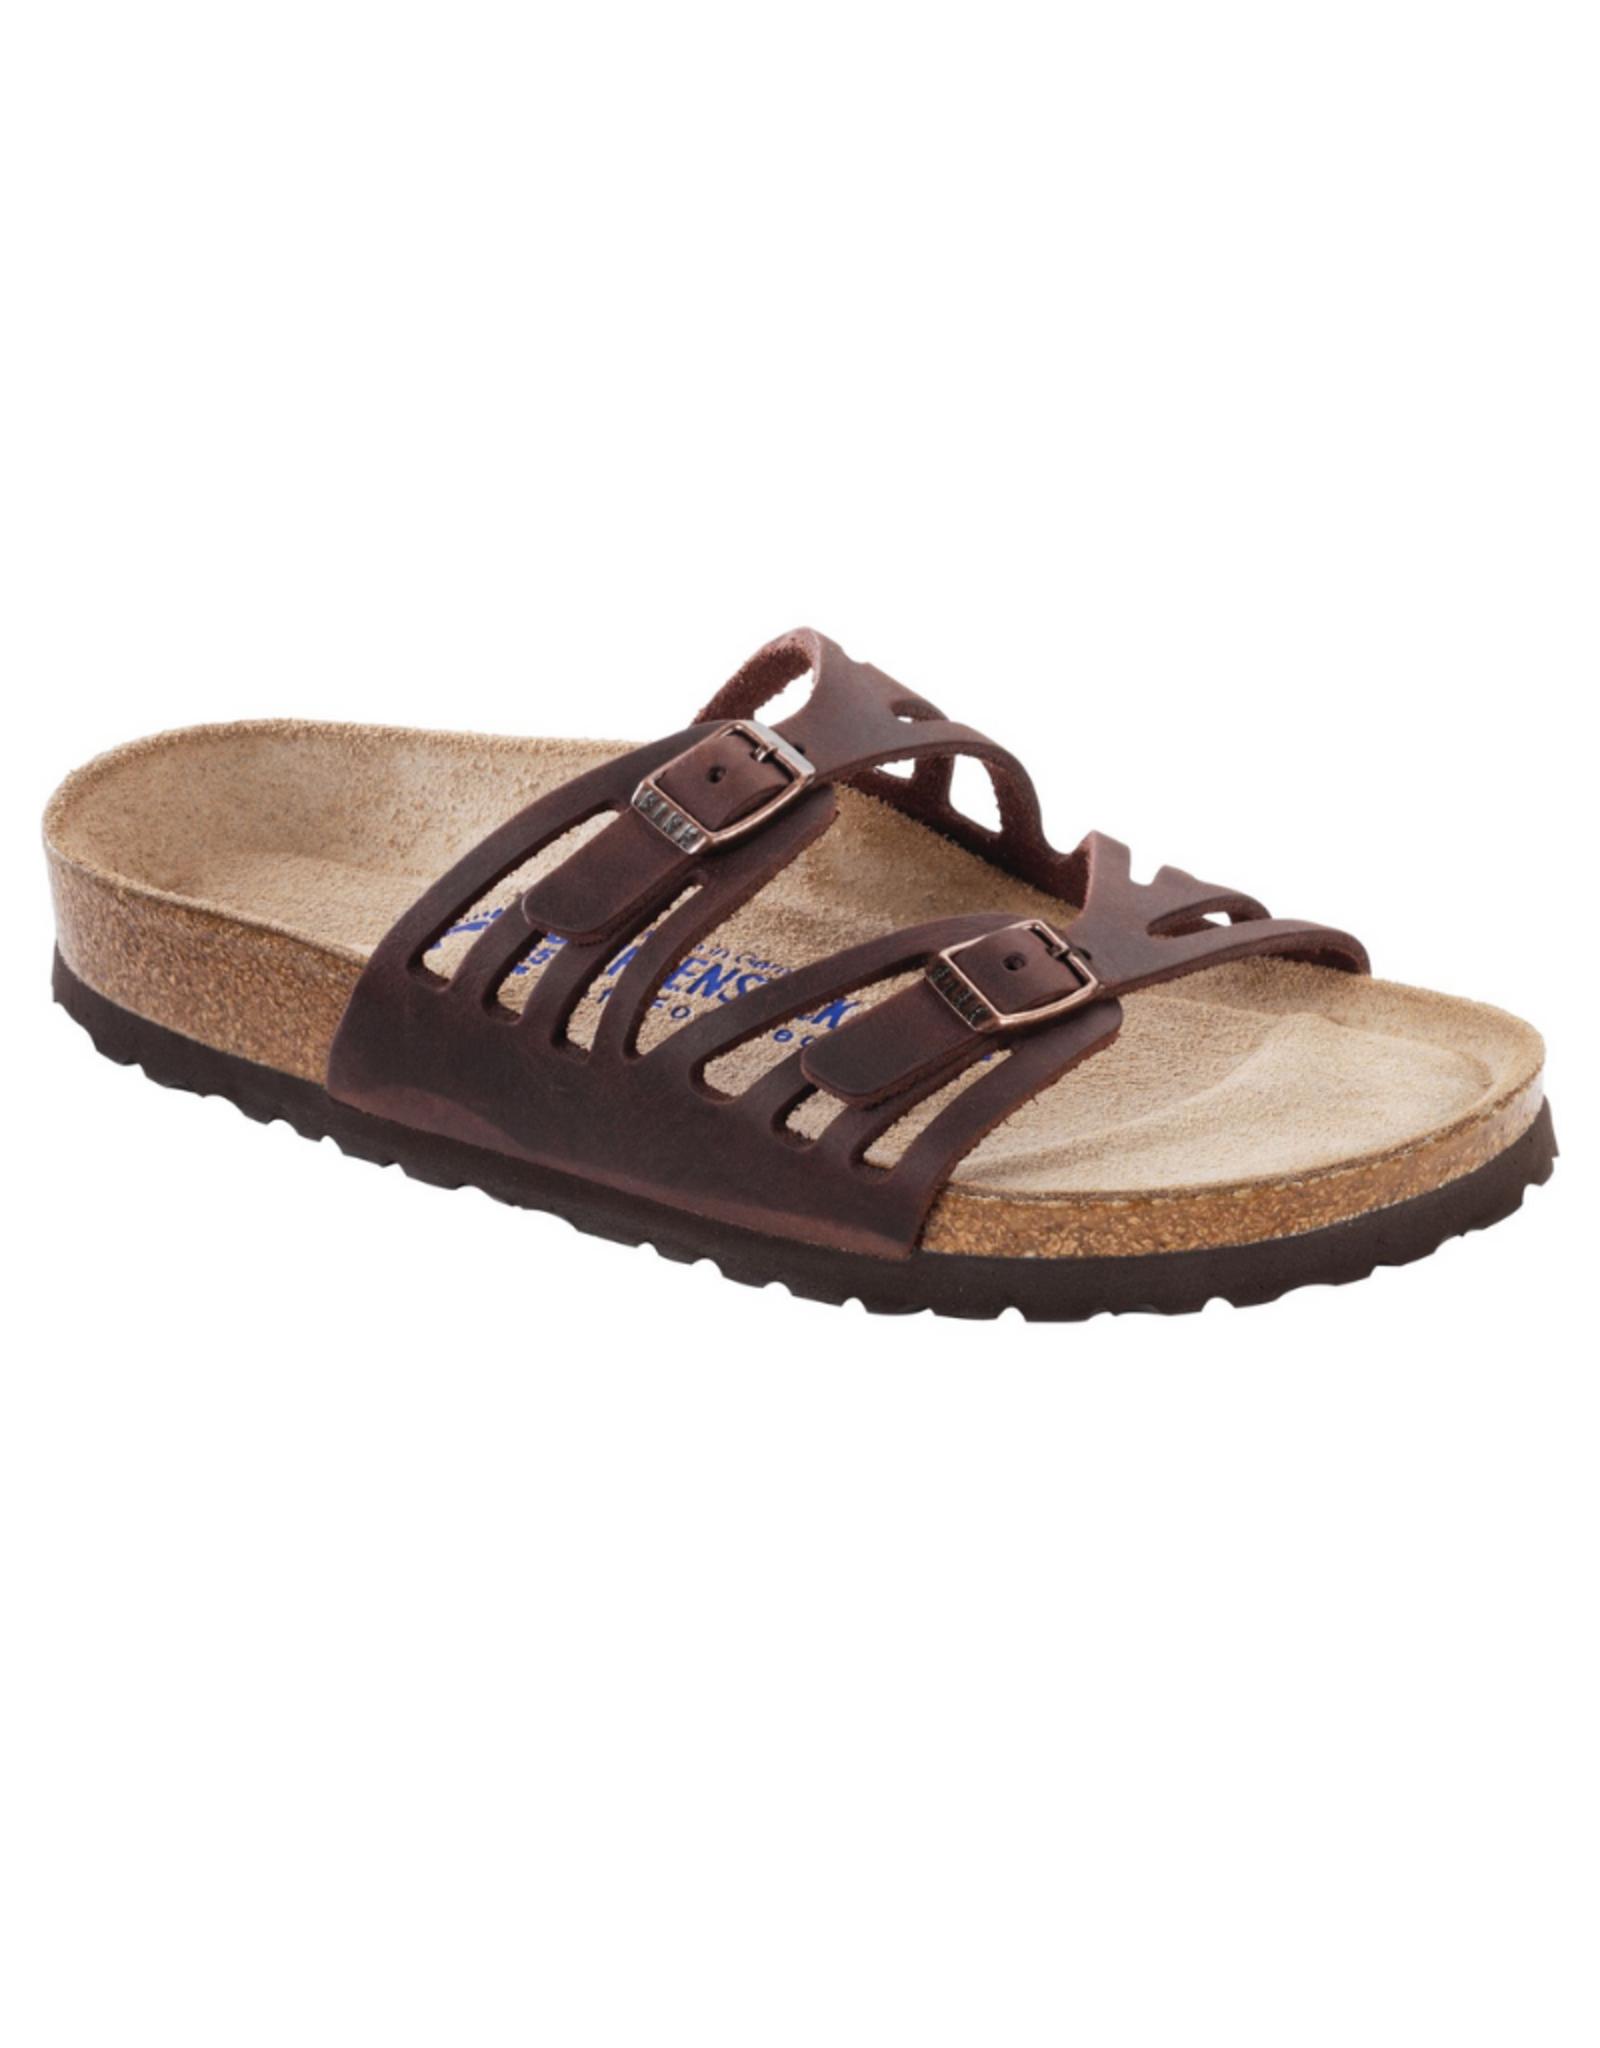 Granada Habana Oiled Leather Soft Footbed